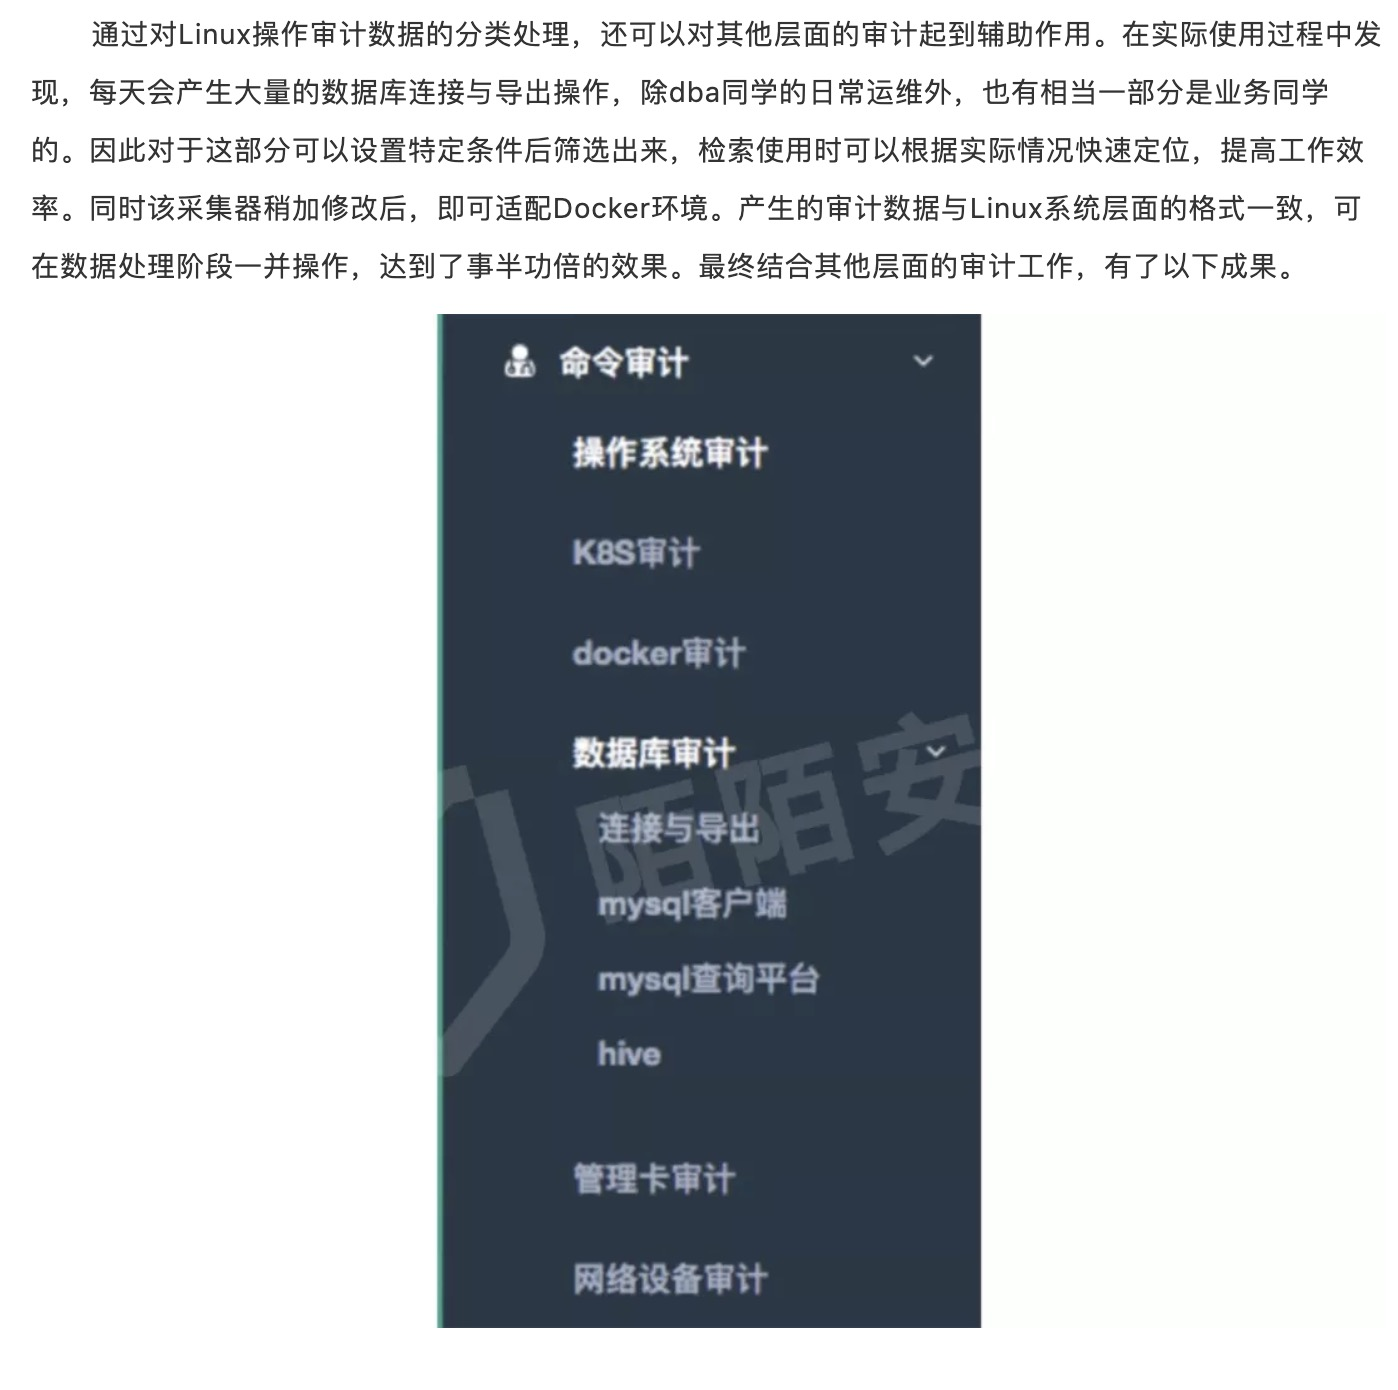 https://momo-mmsrc.oss-cn-hangzhou.aliyuncs.com/img-dd56d70b-6f78-3e56-99af-ce73df0535eb.jpeg